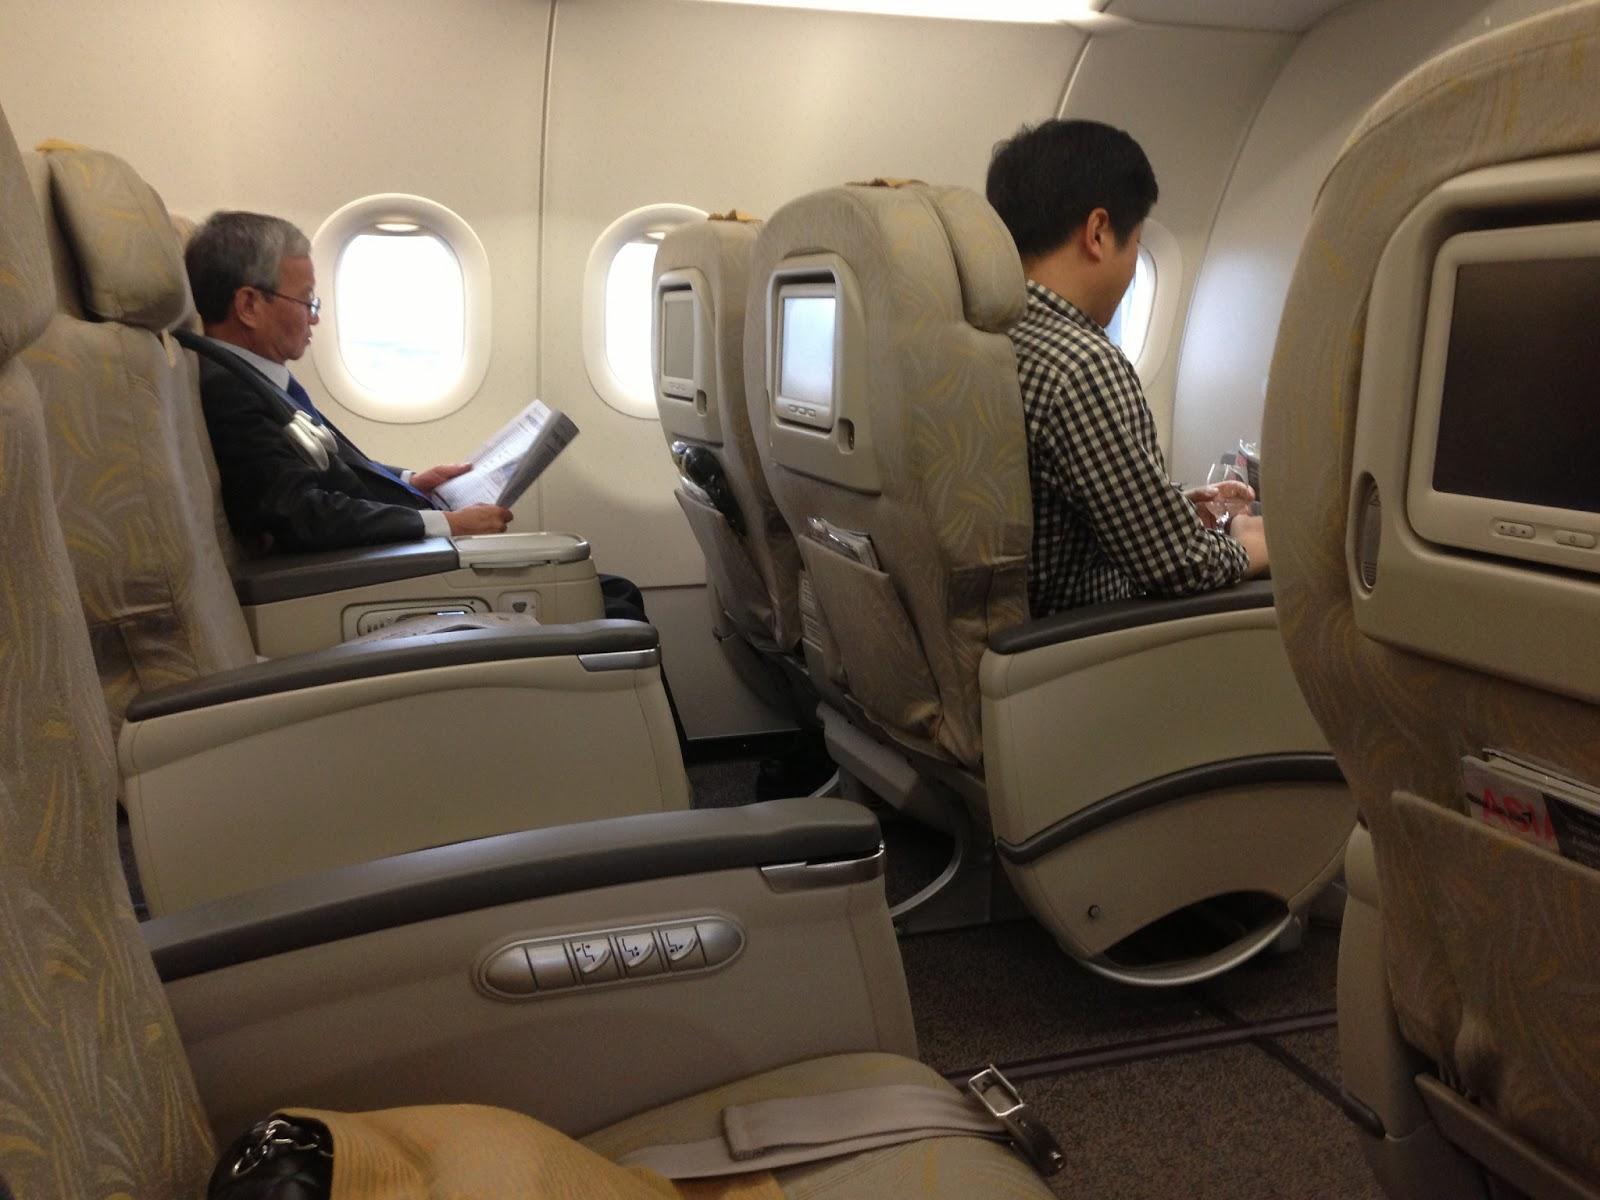 Airbus A321 Business Class Seats Www Microfinanceindia Org